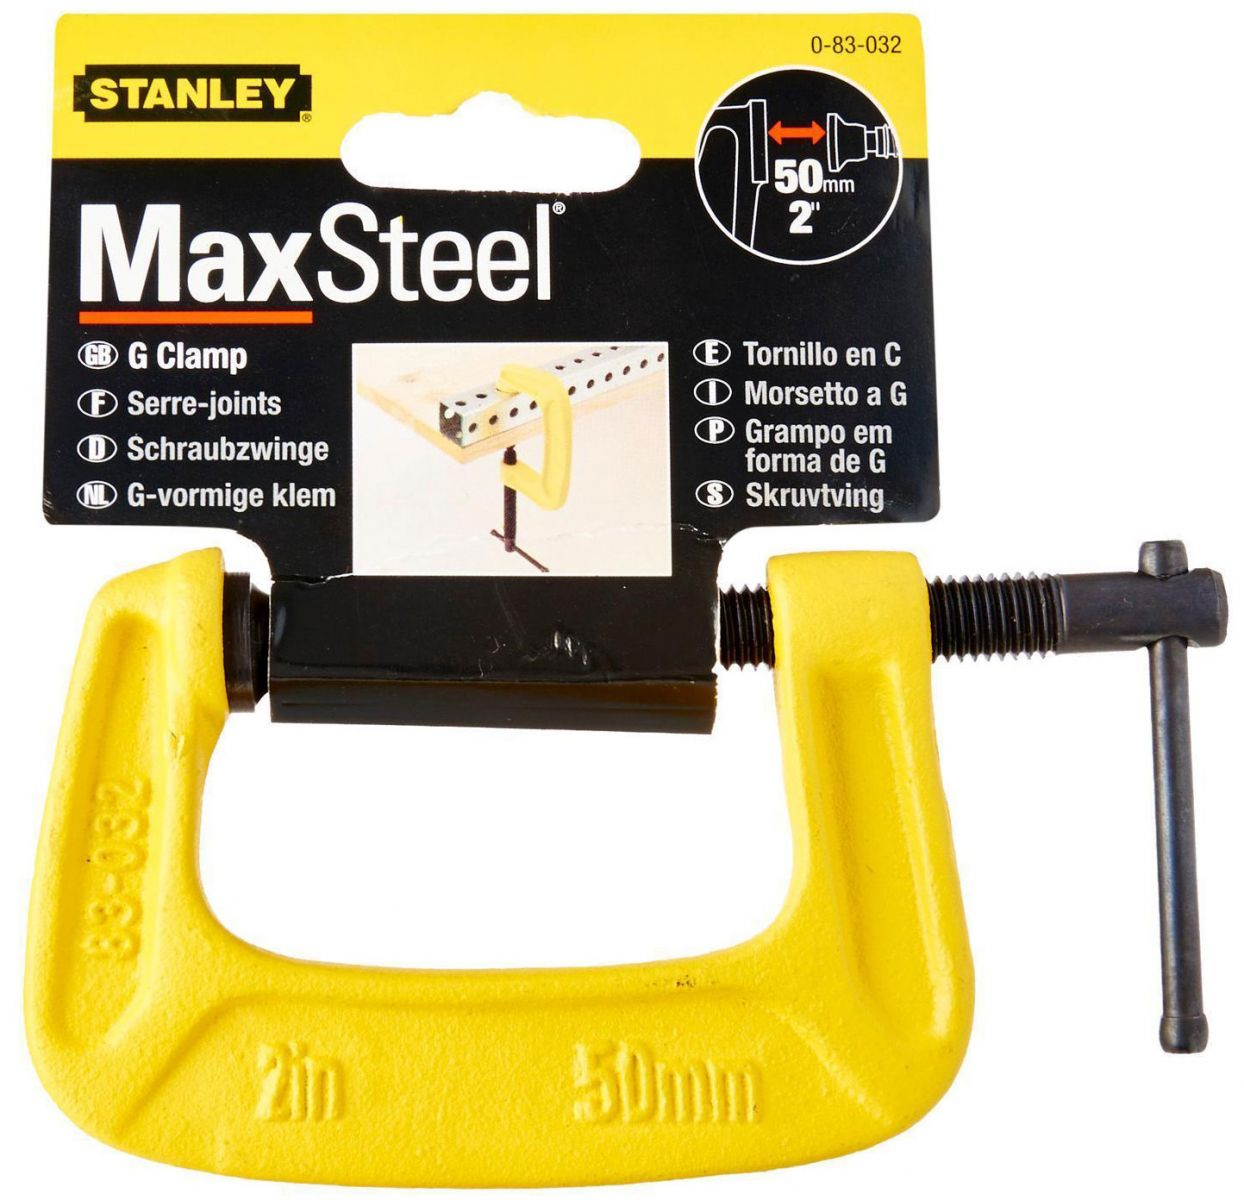 "Kẹp kiểu chữ C 4"" Stanley 83-034K"